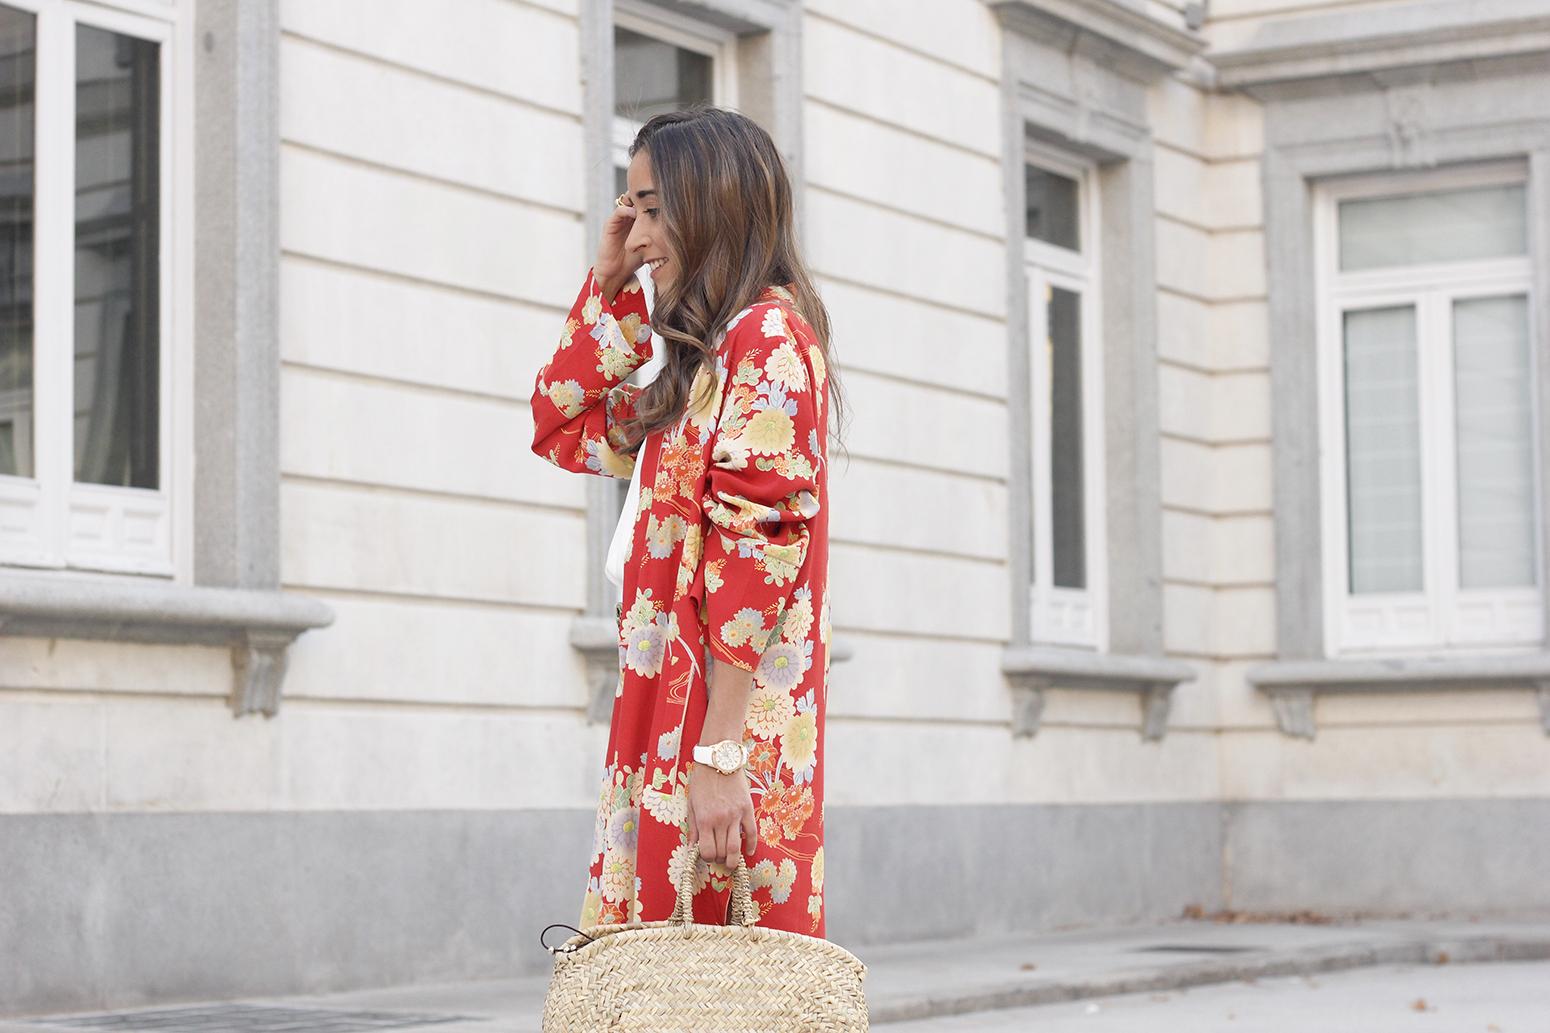 Flowered maxi kimono denim short heels summer girl style fashion09